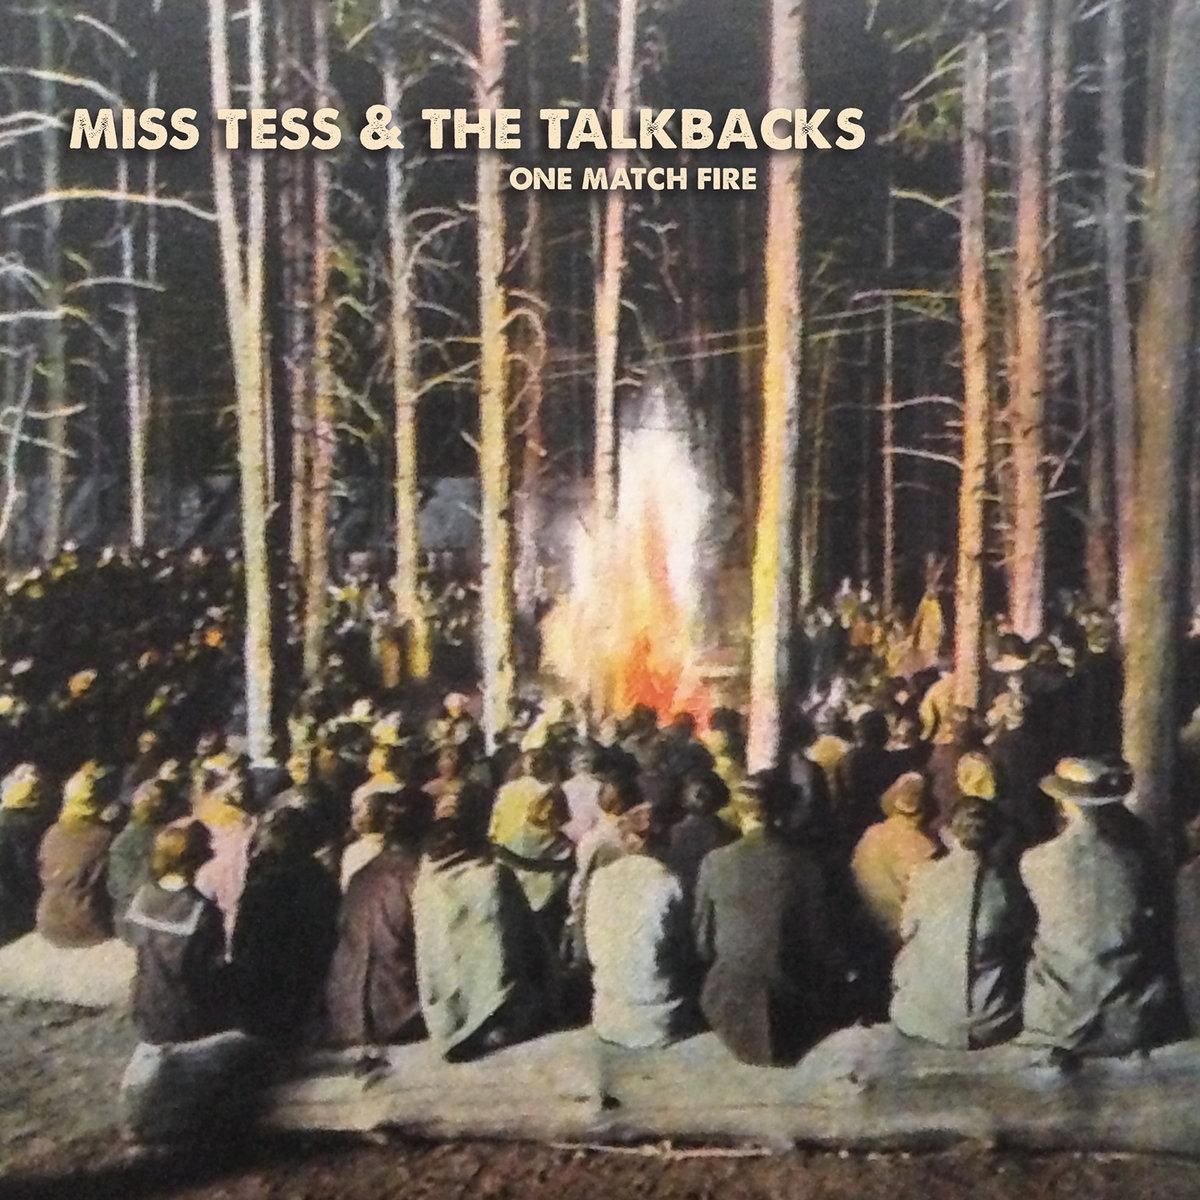 One Match Fire by Miss Tess & The Talkbacks